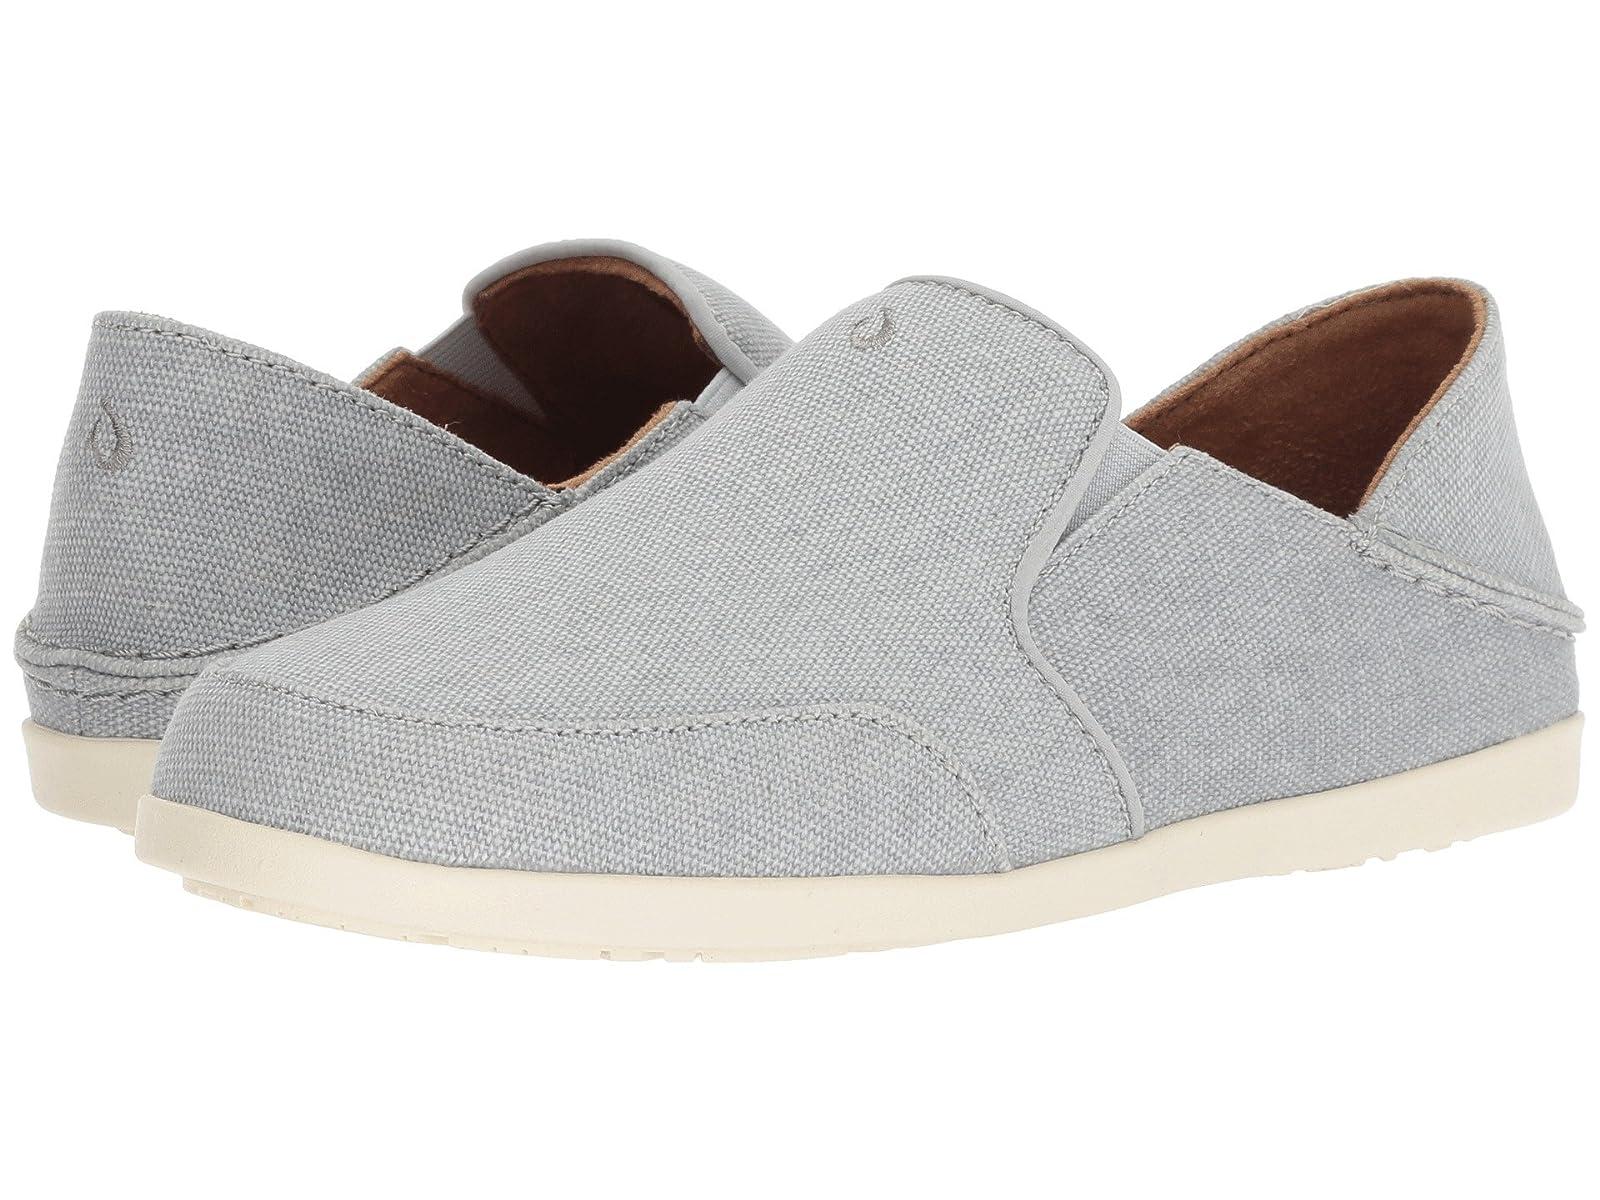 OluKai Waialua CanvasAtmospheric grades have affordable shoes